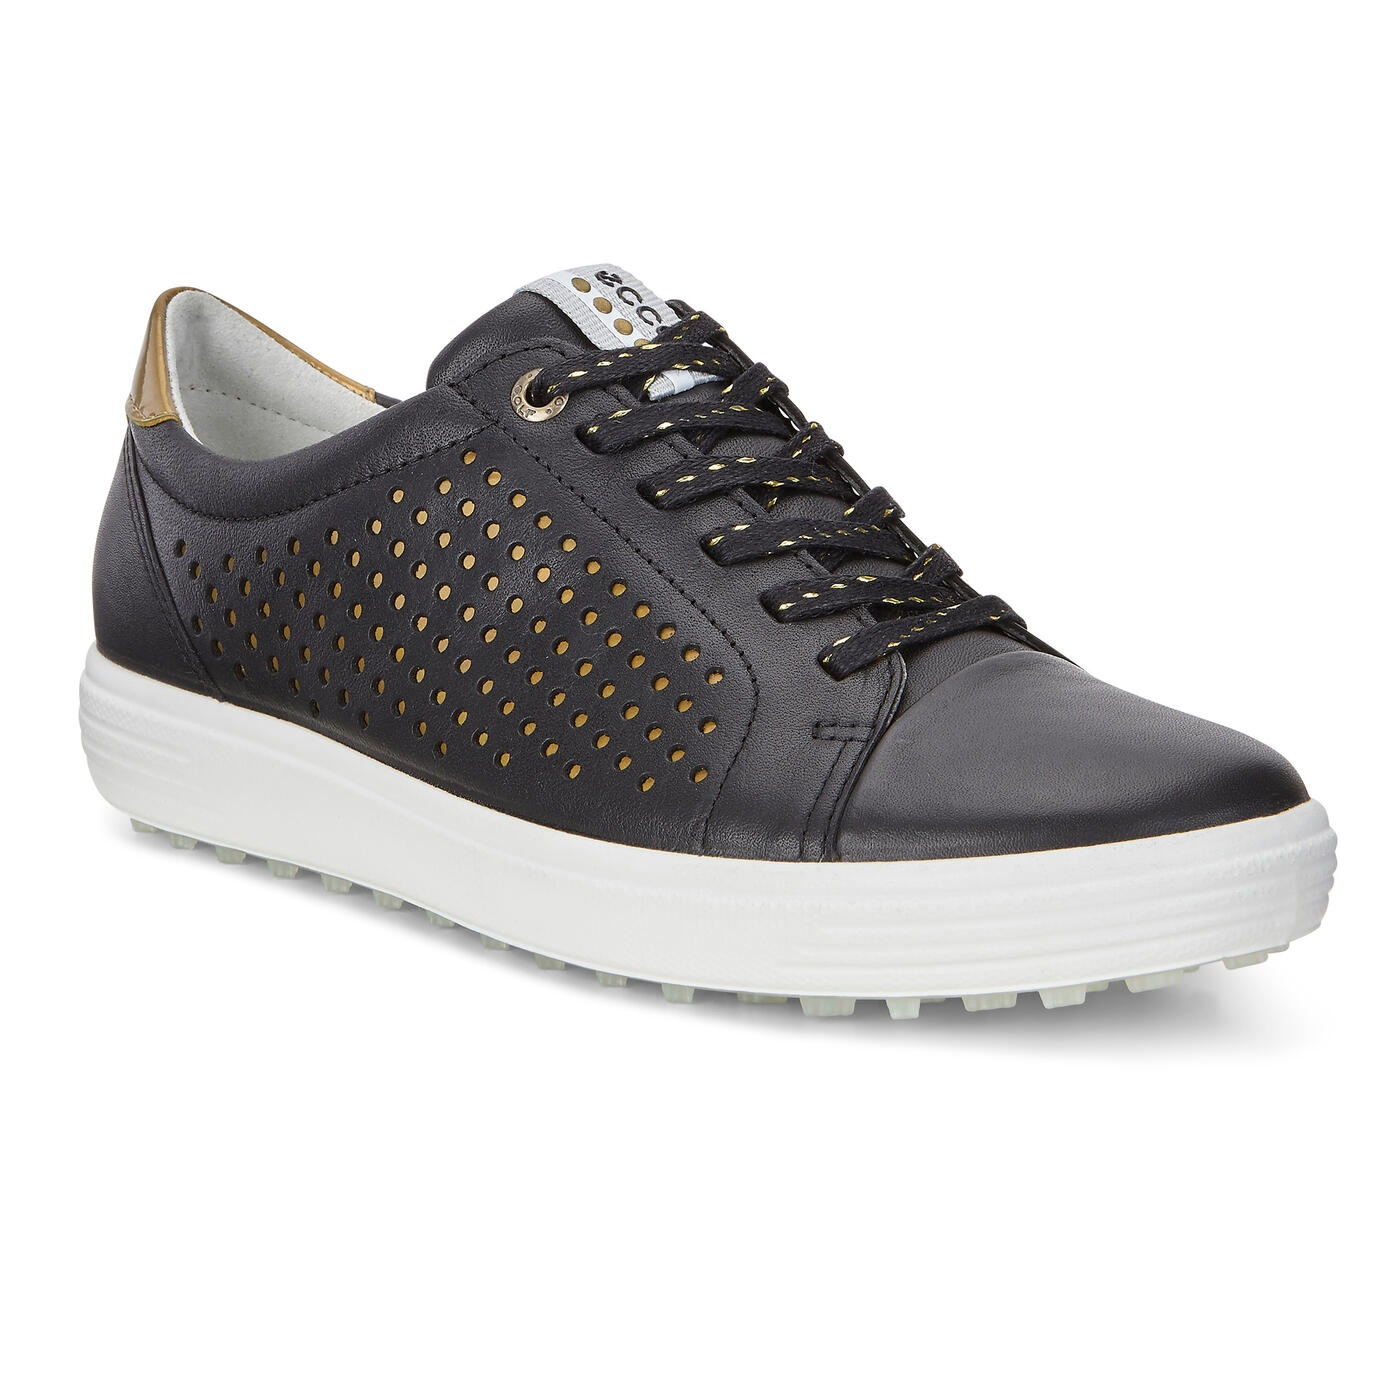 Giày chơi golf nữ ECCO Casual Hybrid 2 phiên bản Black/White